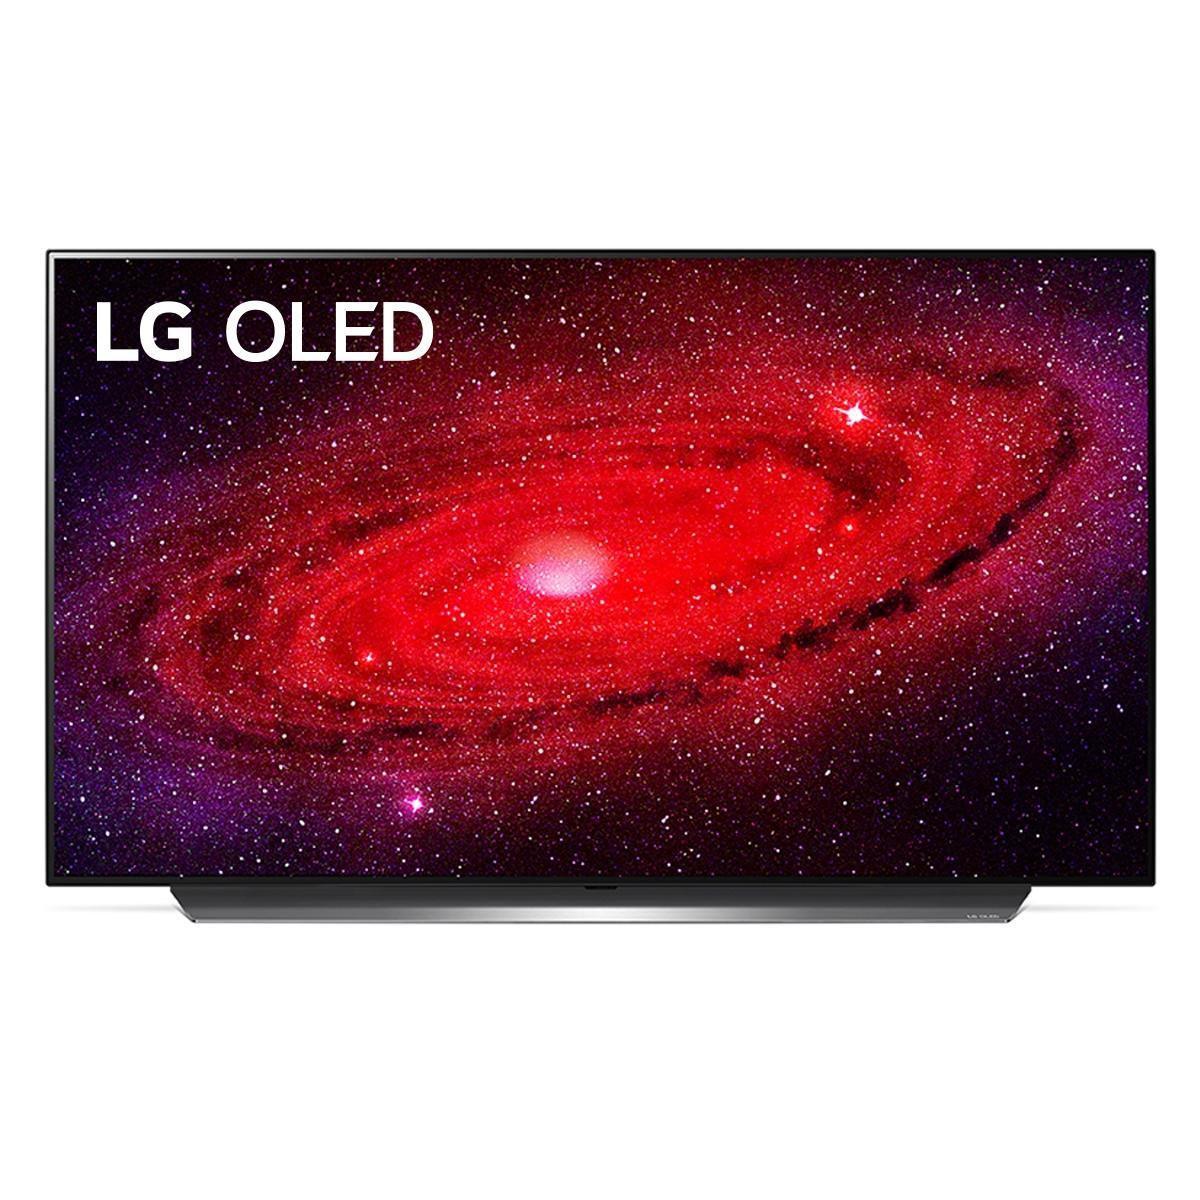 LG OLED48CX6LB 121,9 cm (48) 4K Ultra HD Smart TV Wi-Fi Zwart, Zilver